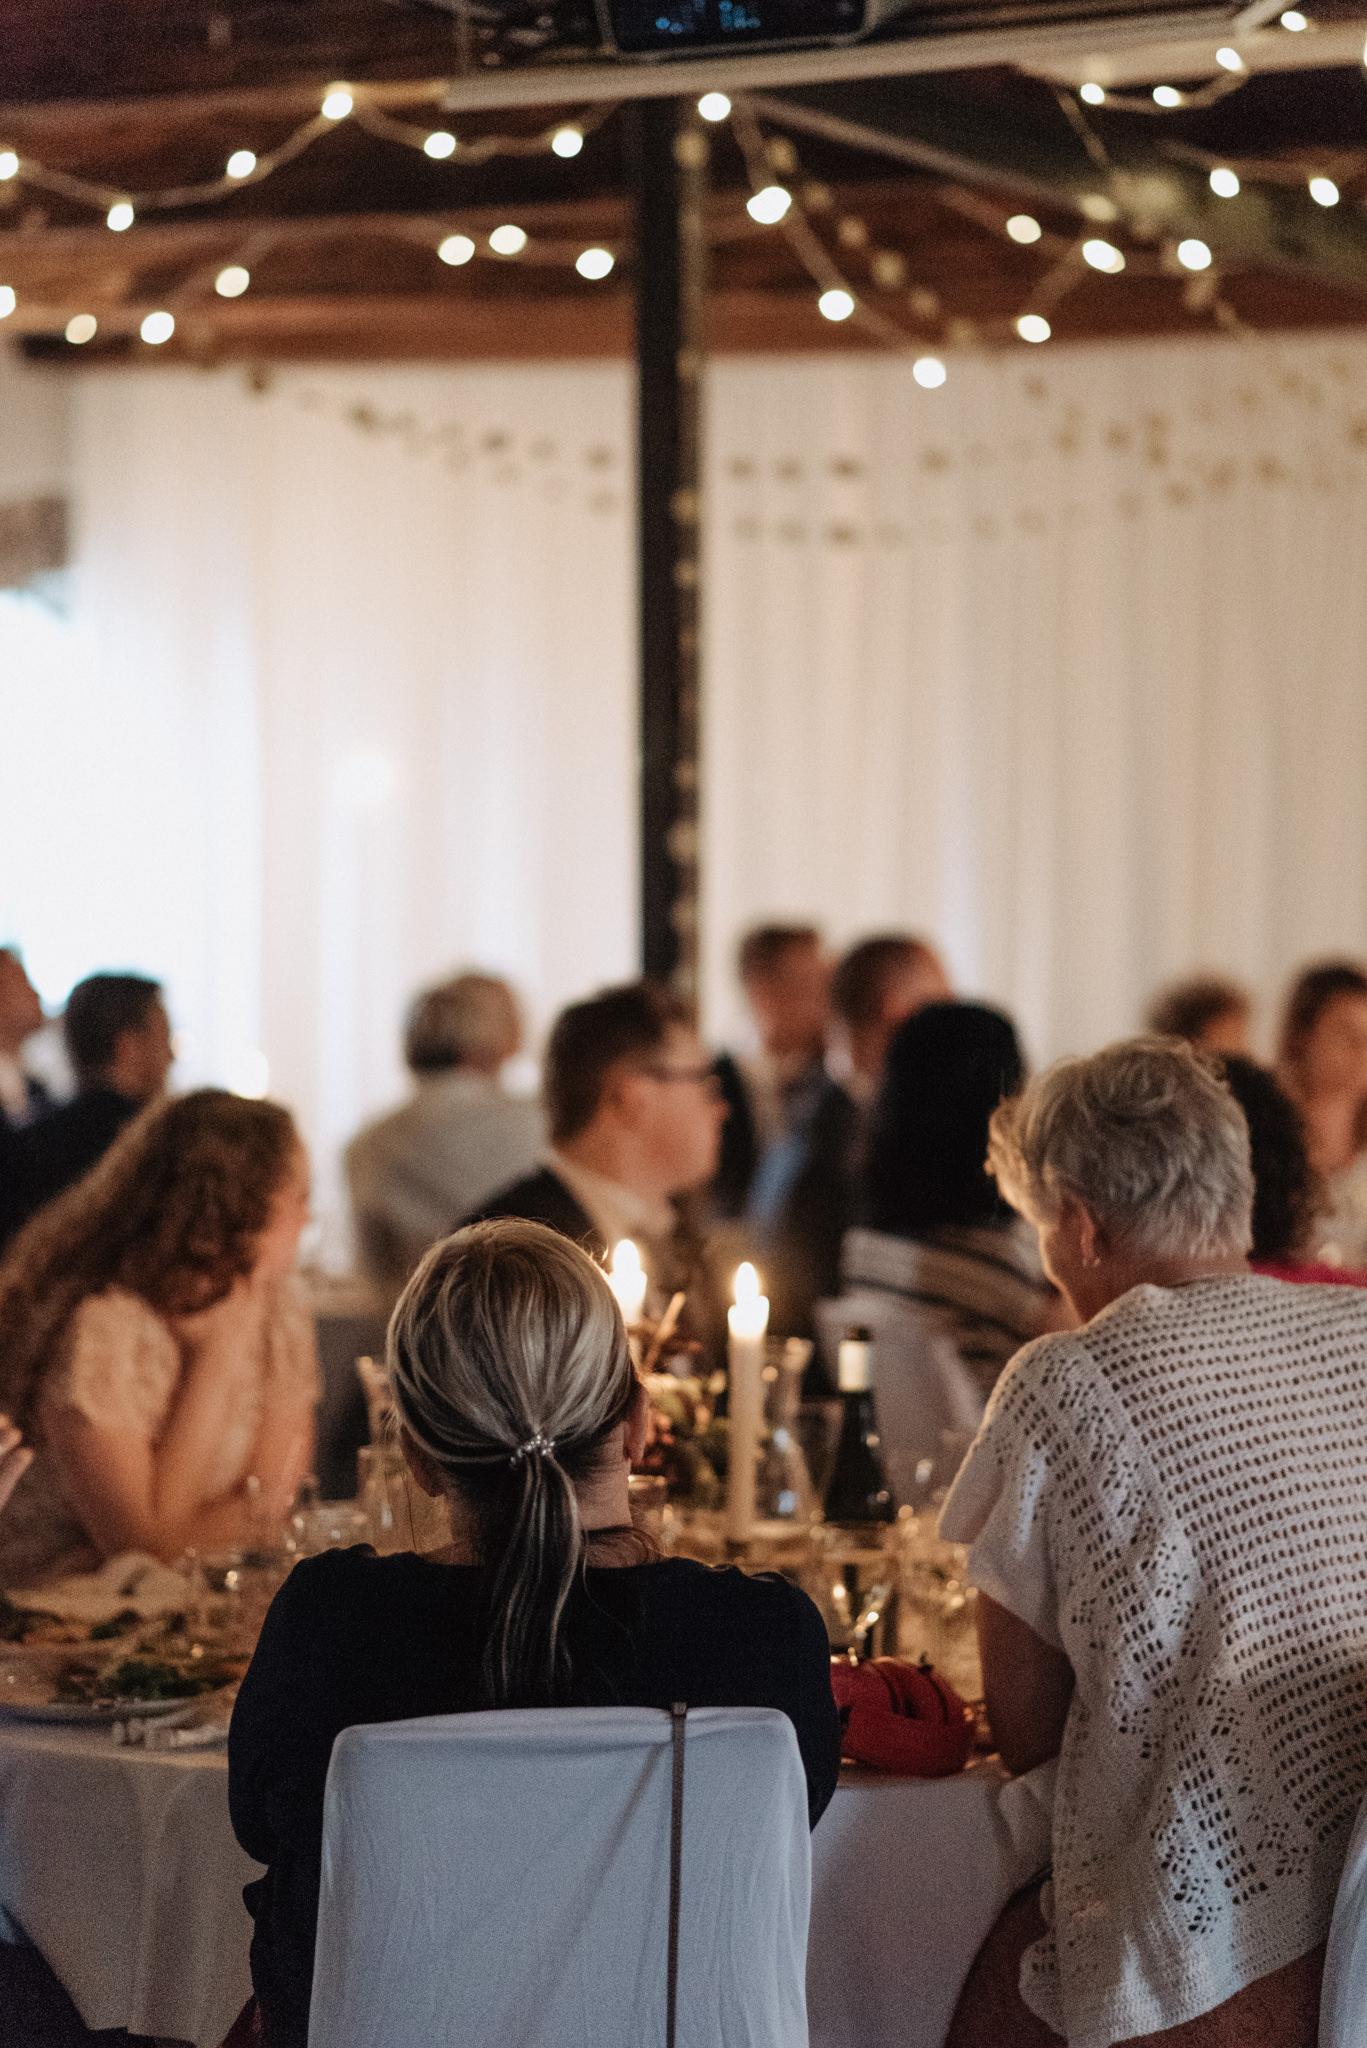 bohemiskt-bröllop-på-nygård-event-i-åstorp-bröllopsfotograf-skåne-164.jpg